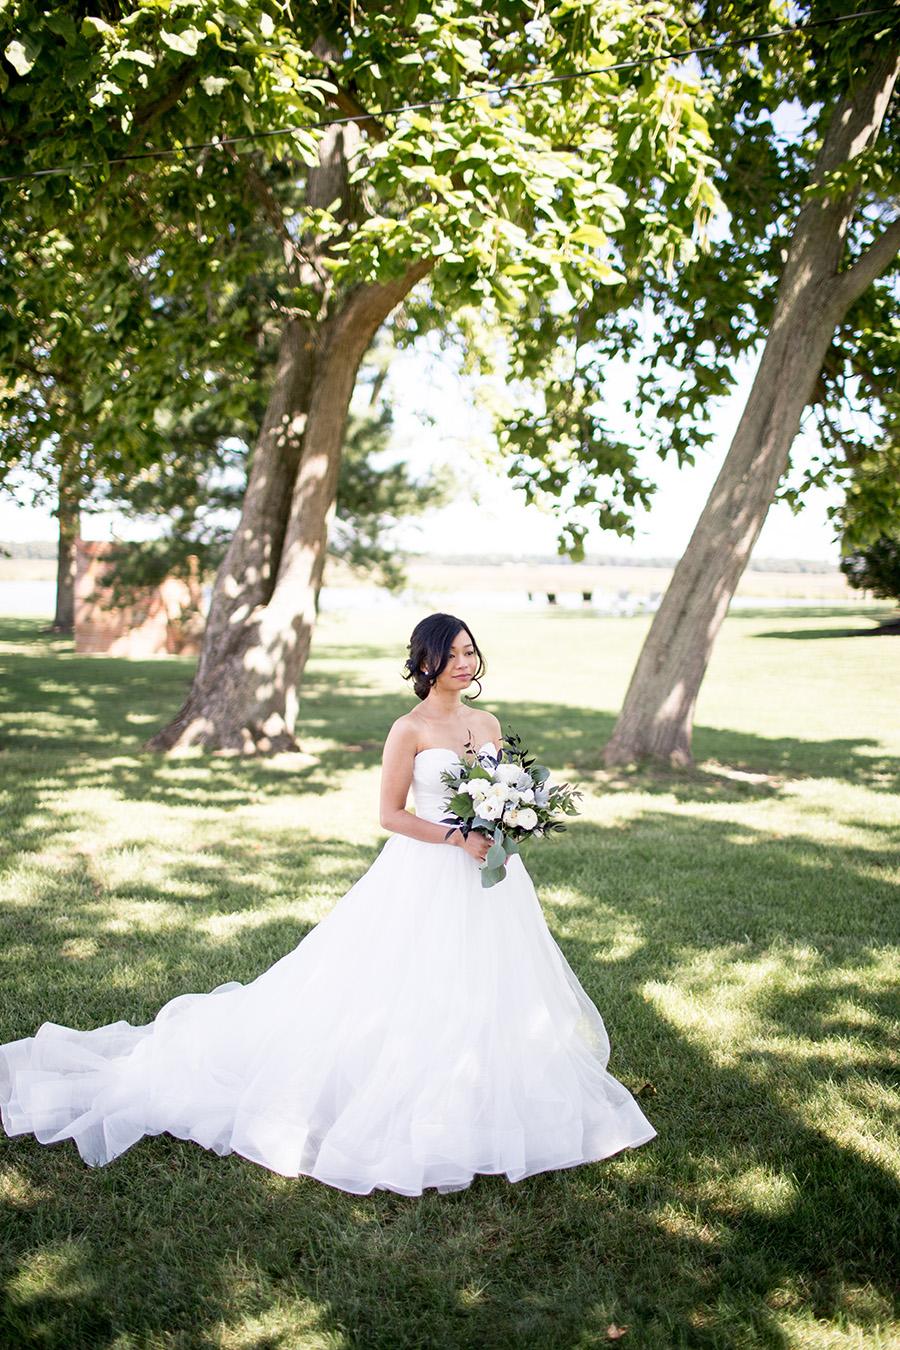 bride looking at her groom in her wedding gown